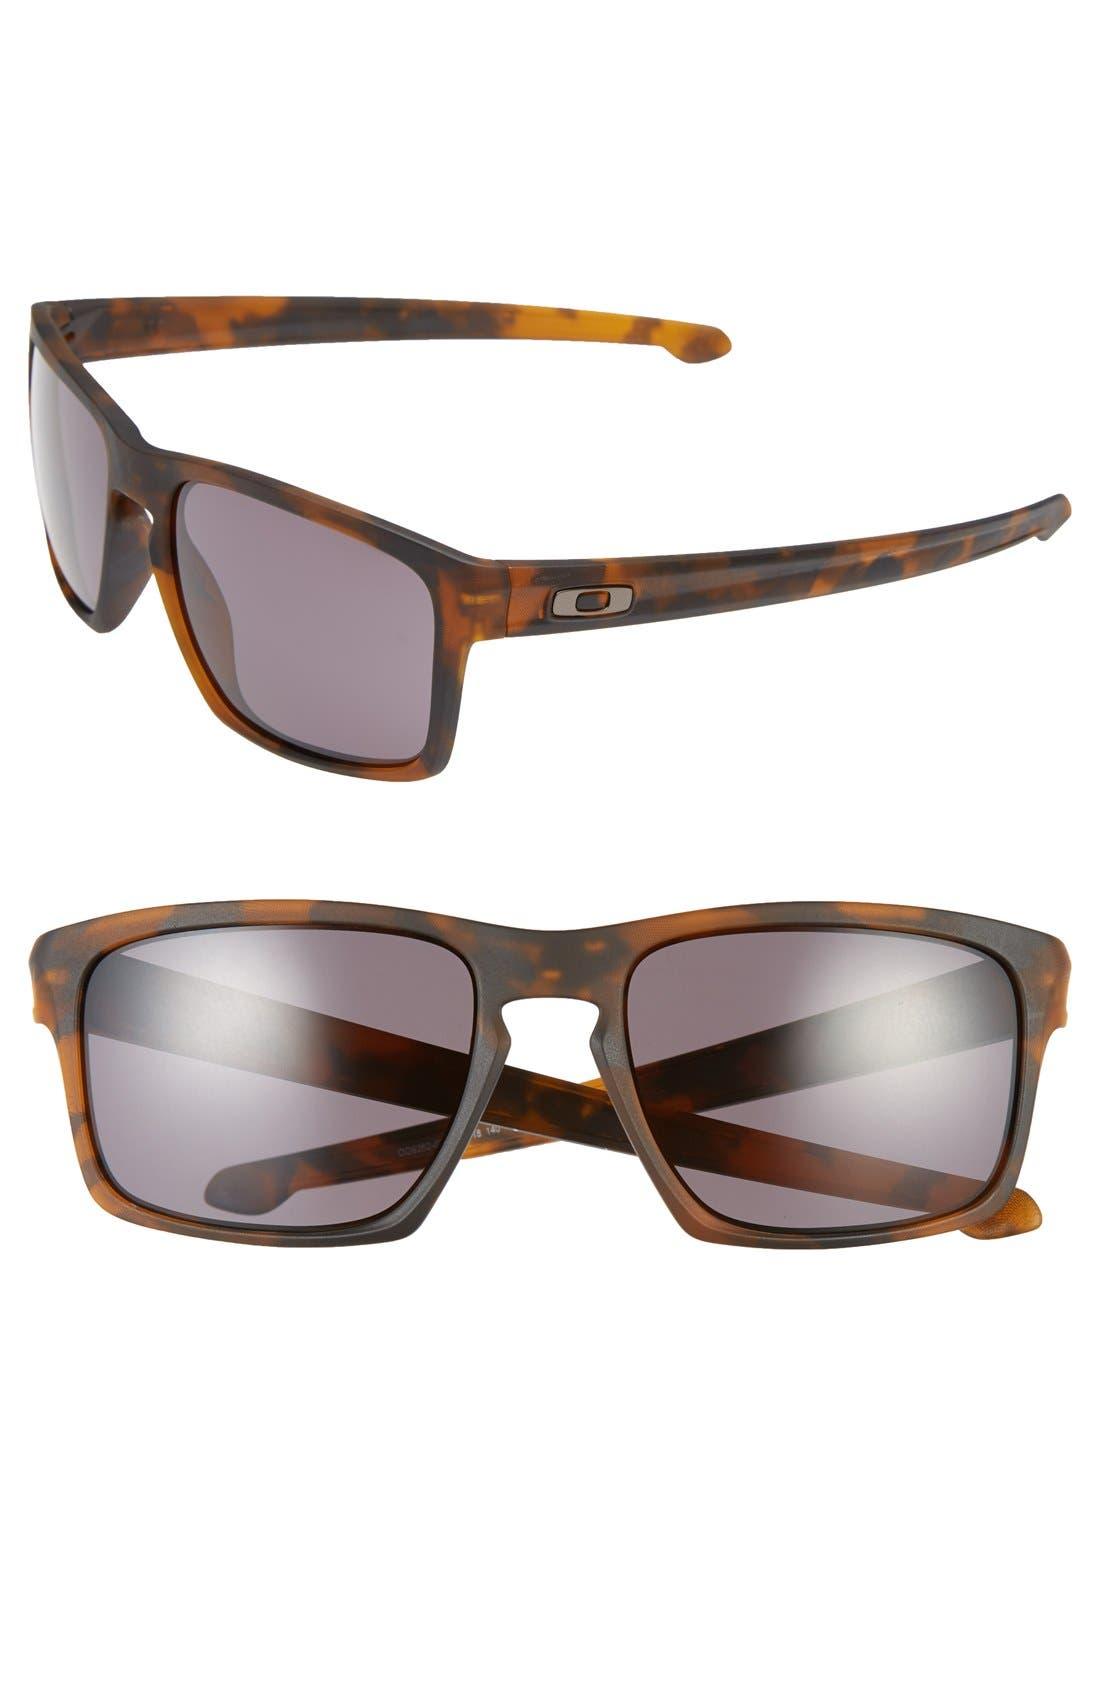 Oakley 'Sliver® F' 59mm Sunglasses